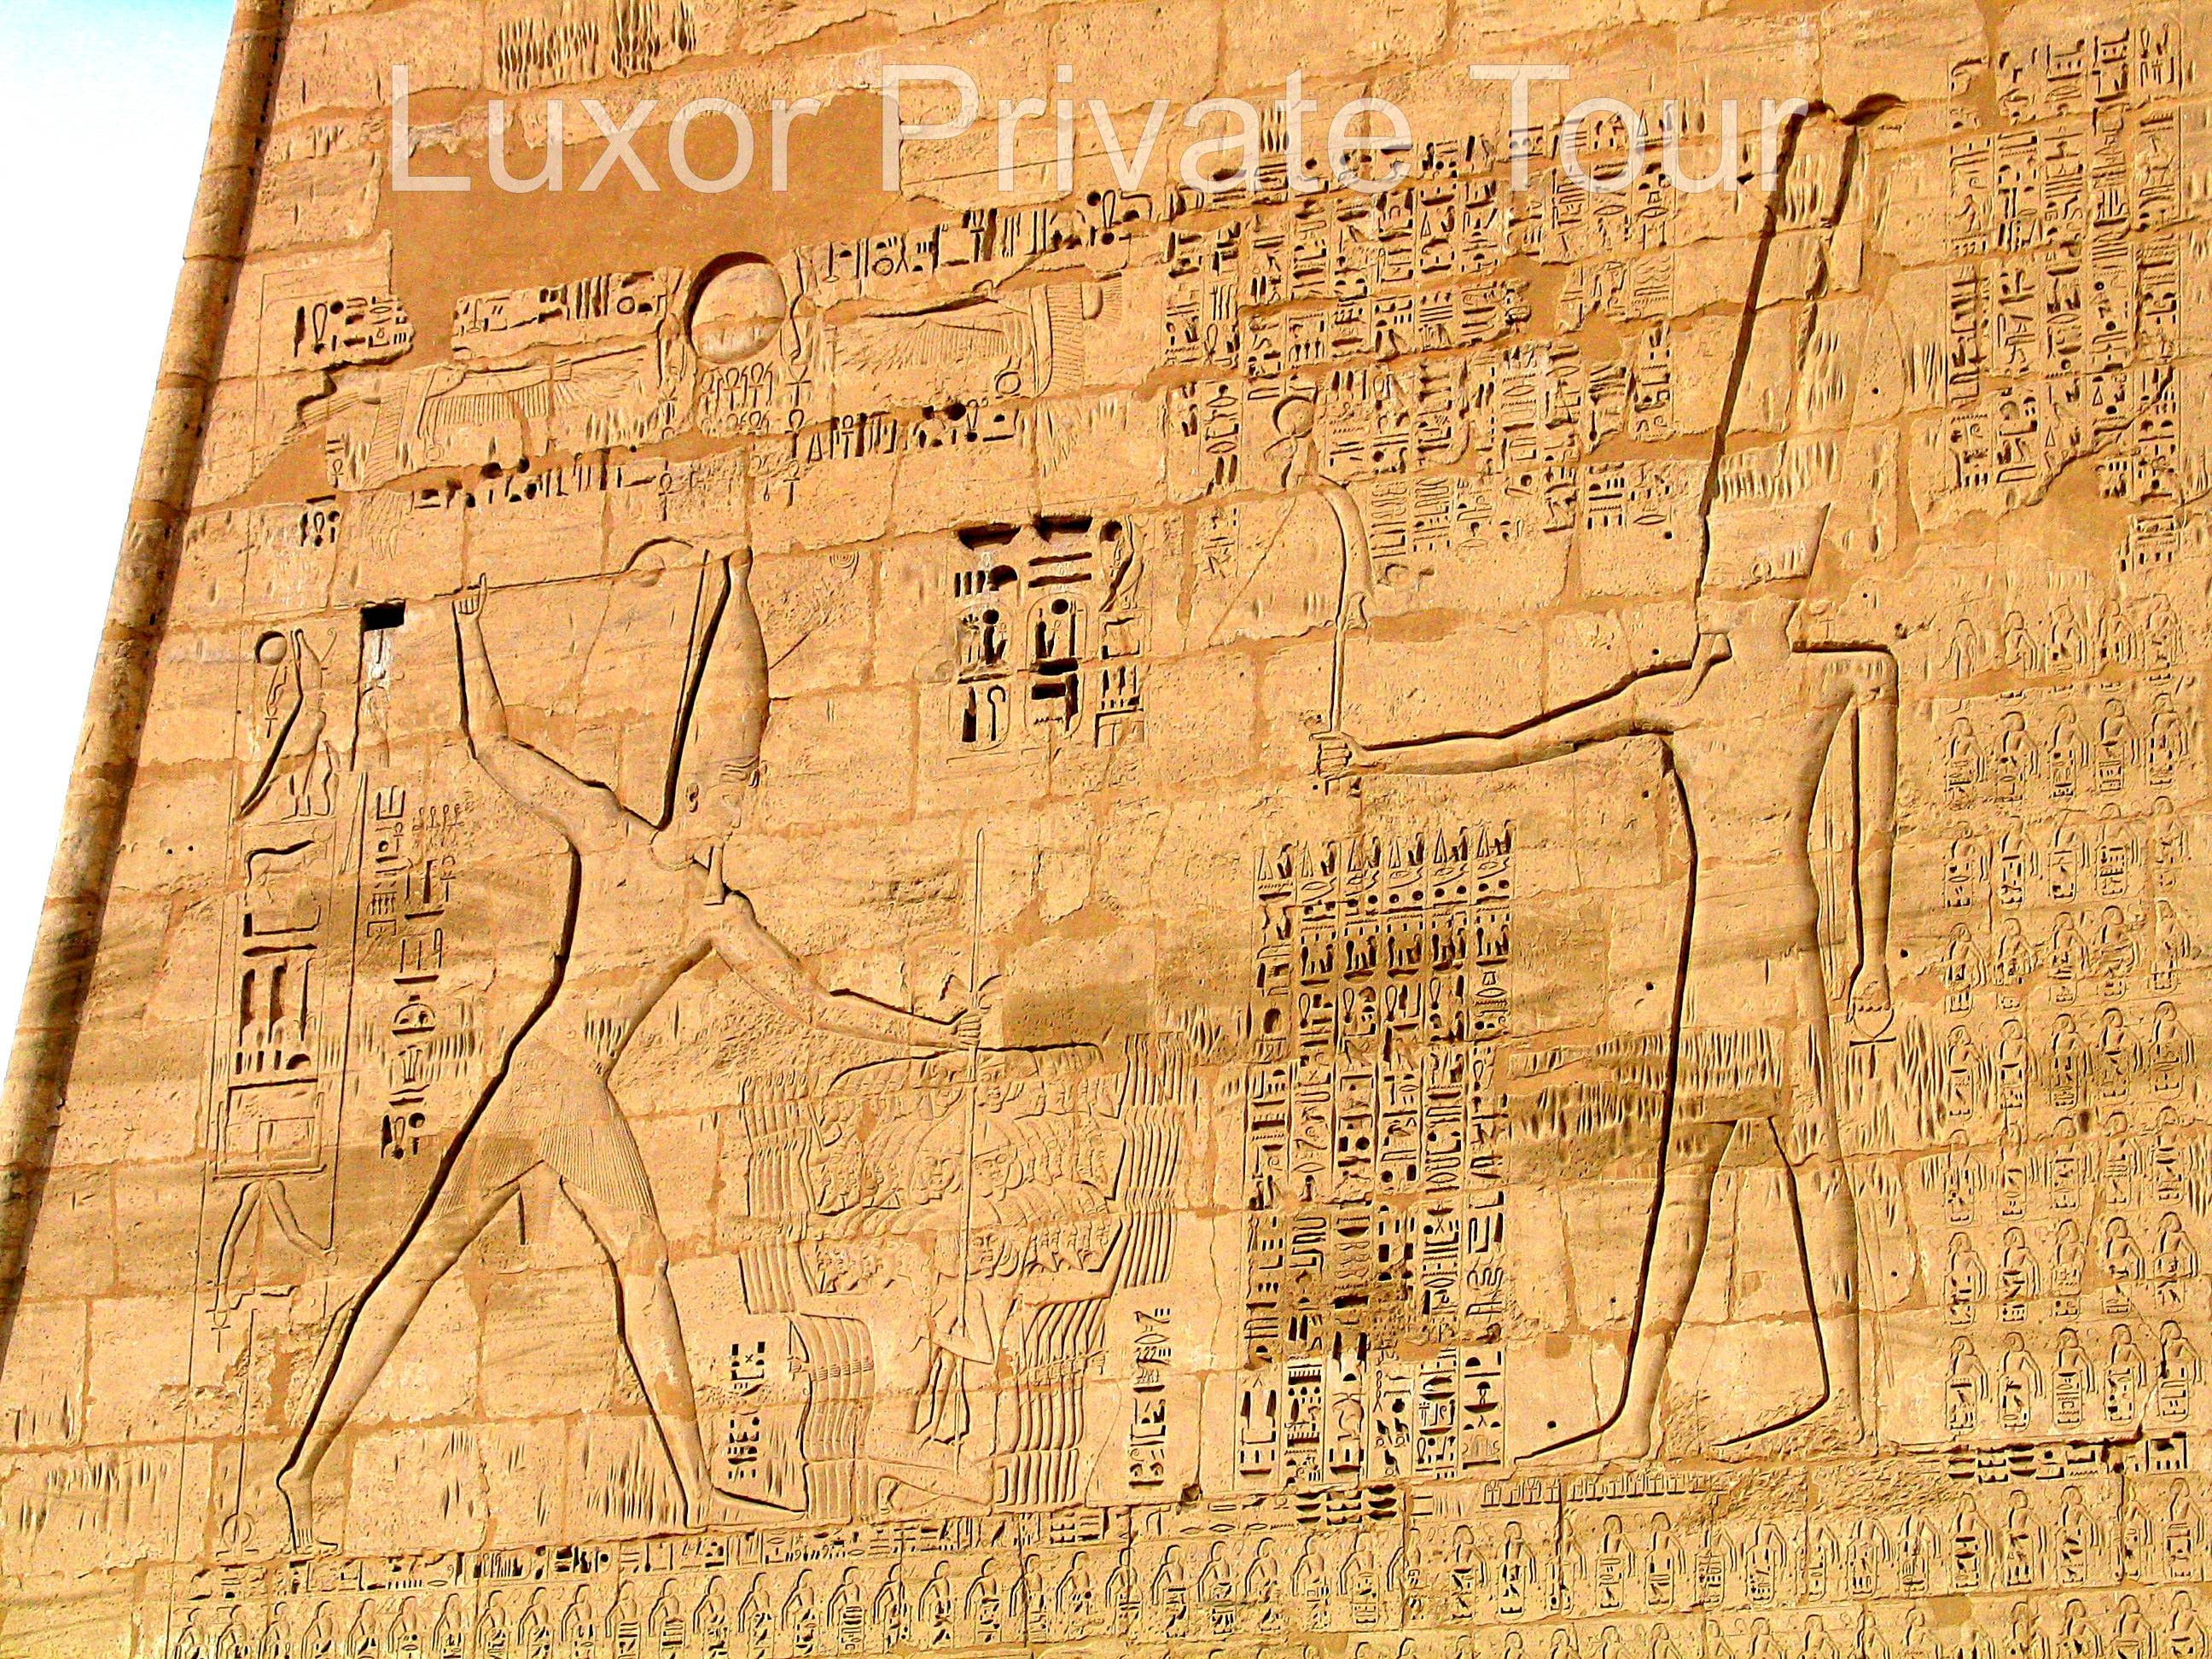 Nile Cruise, Luxor/Aswan/Luxor (8 Days 7 Nights)